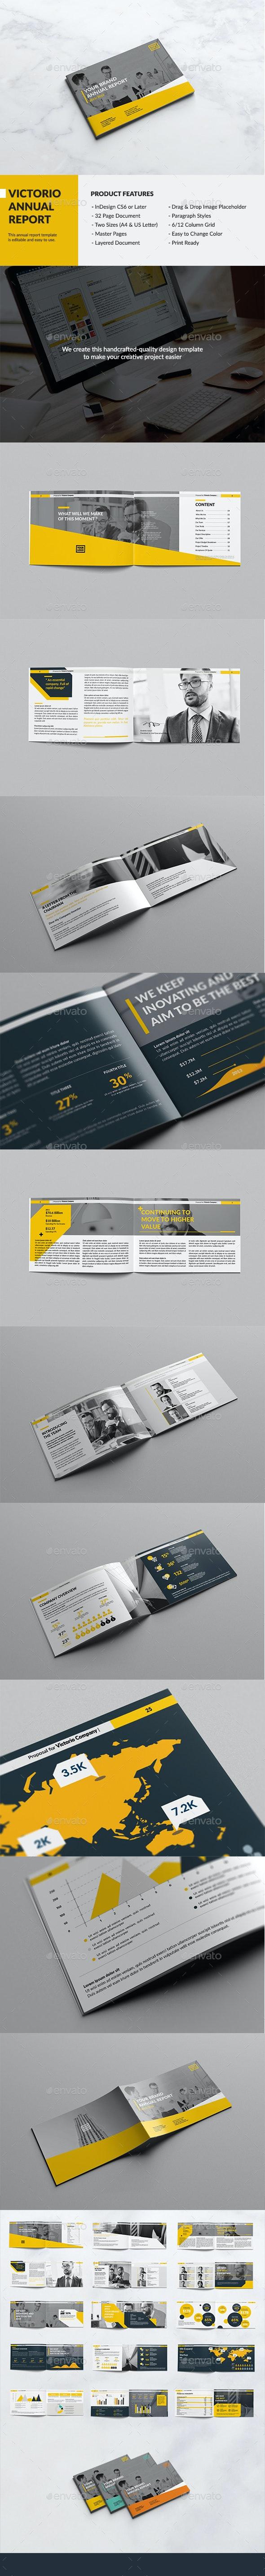 Victorio Landscape Annual Report - Brochures Print Templates